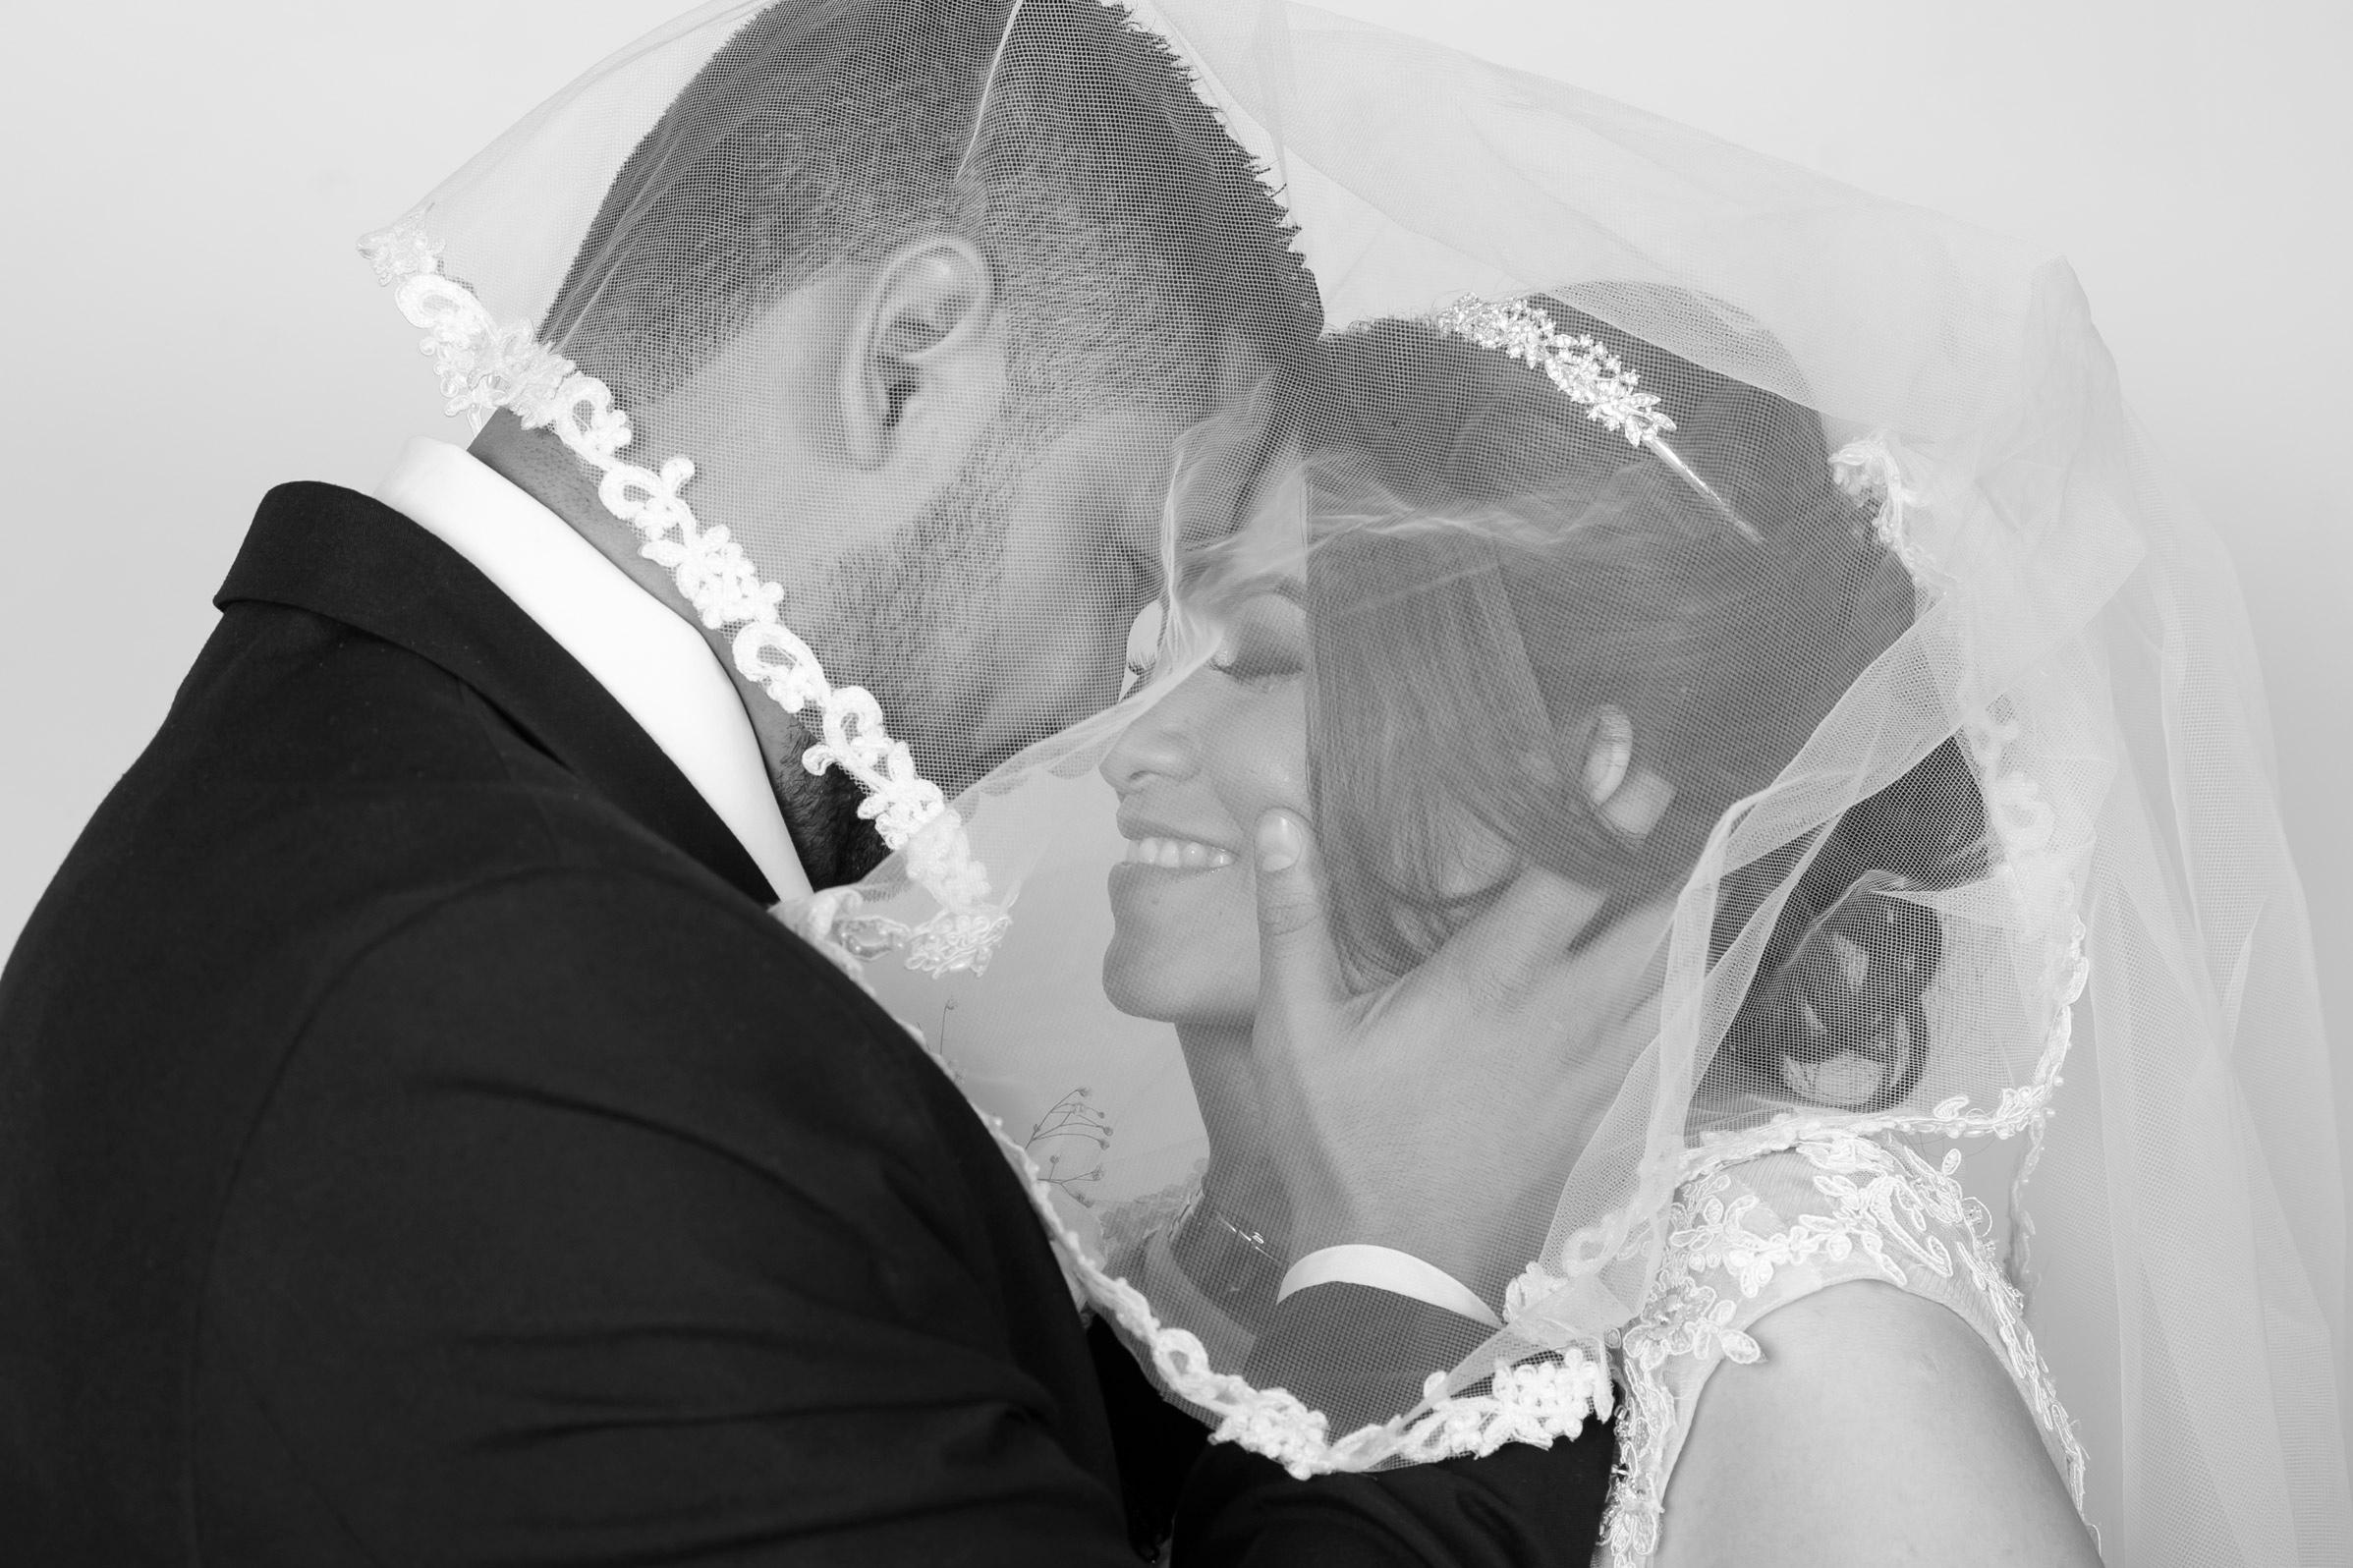 Mike_Mendez_Photography_Wedding_Engagements_13